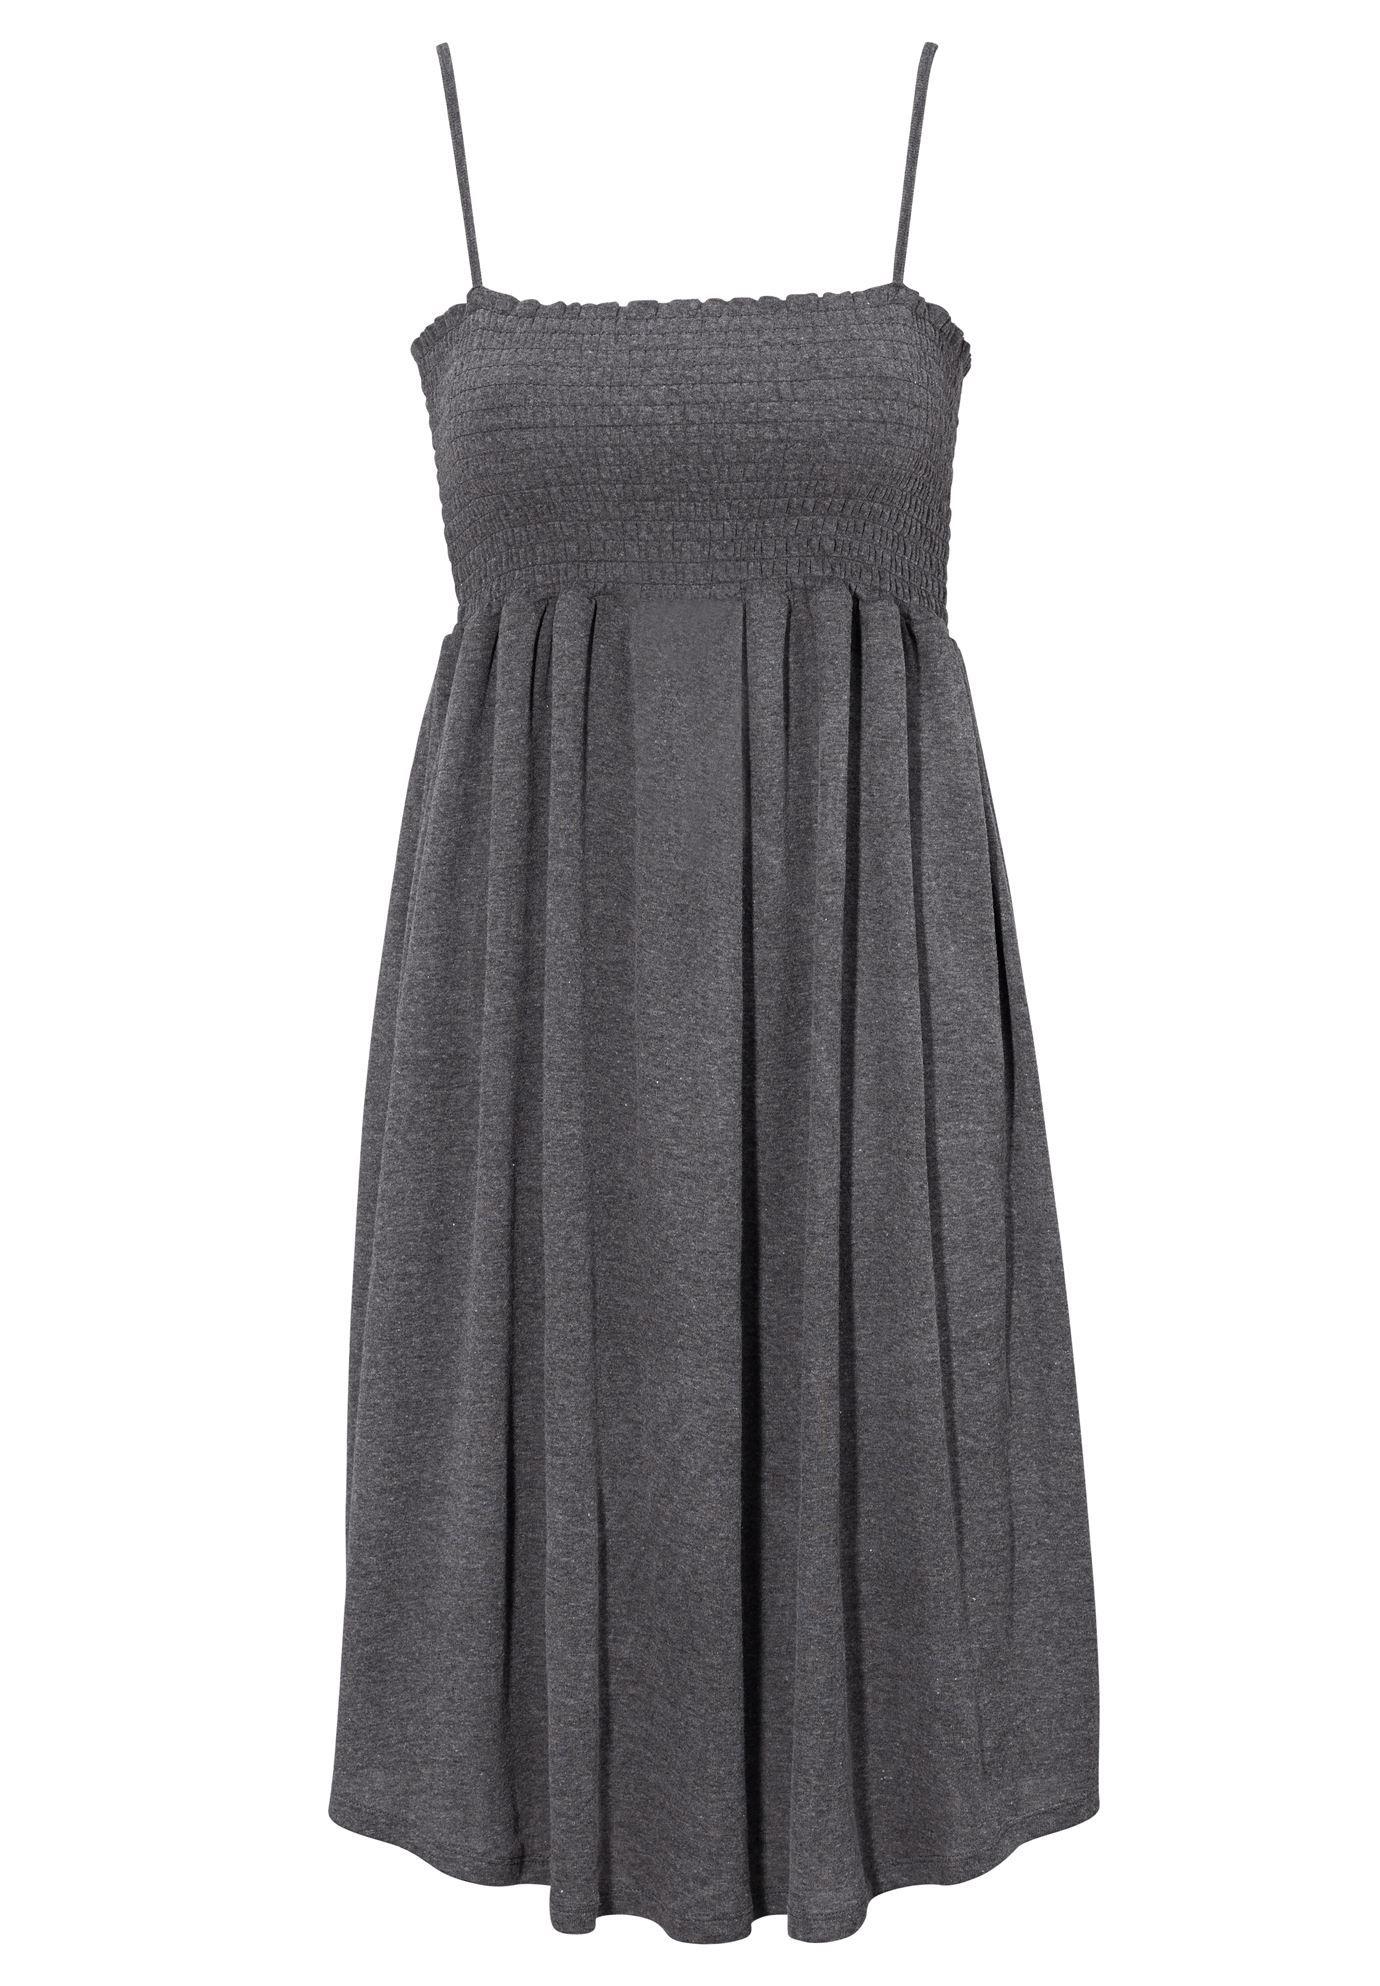 02b9fd35557 Smocked Bodice Dress by Ellos - Women s Plus Size Clothing